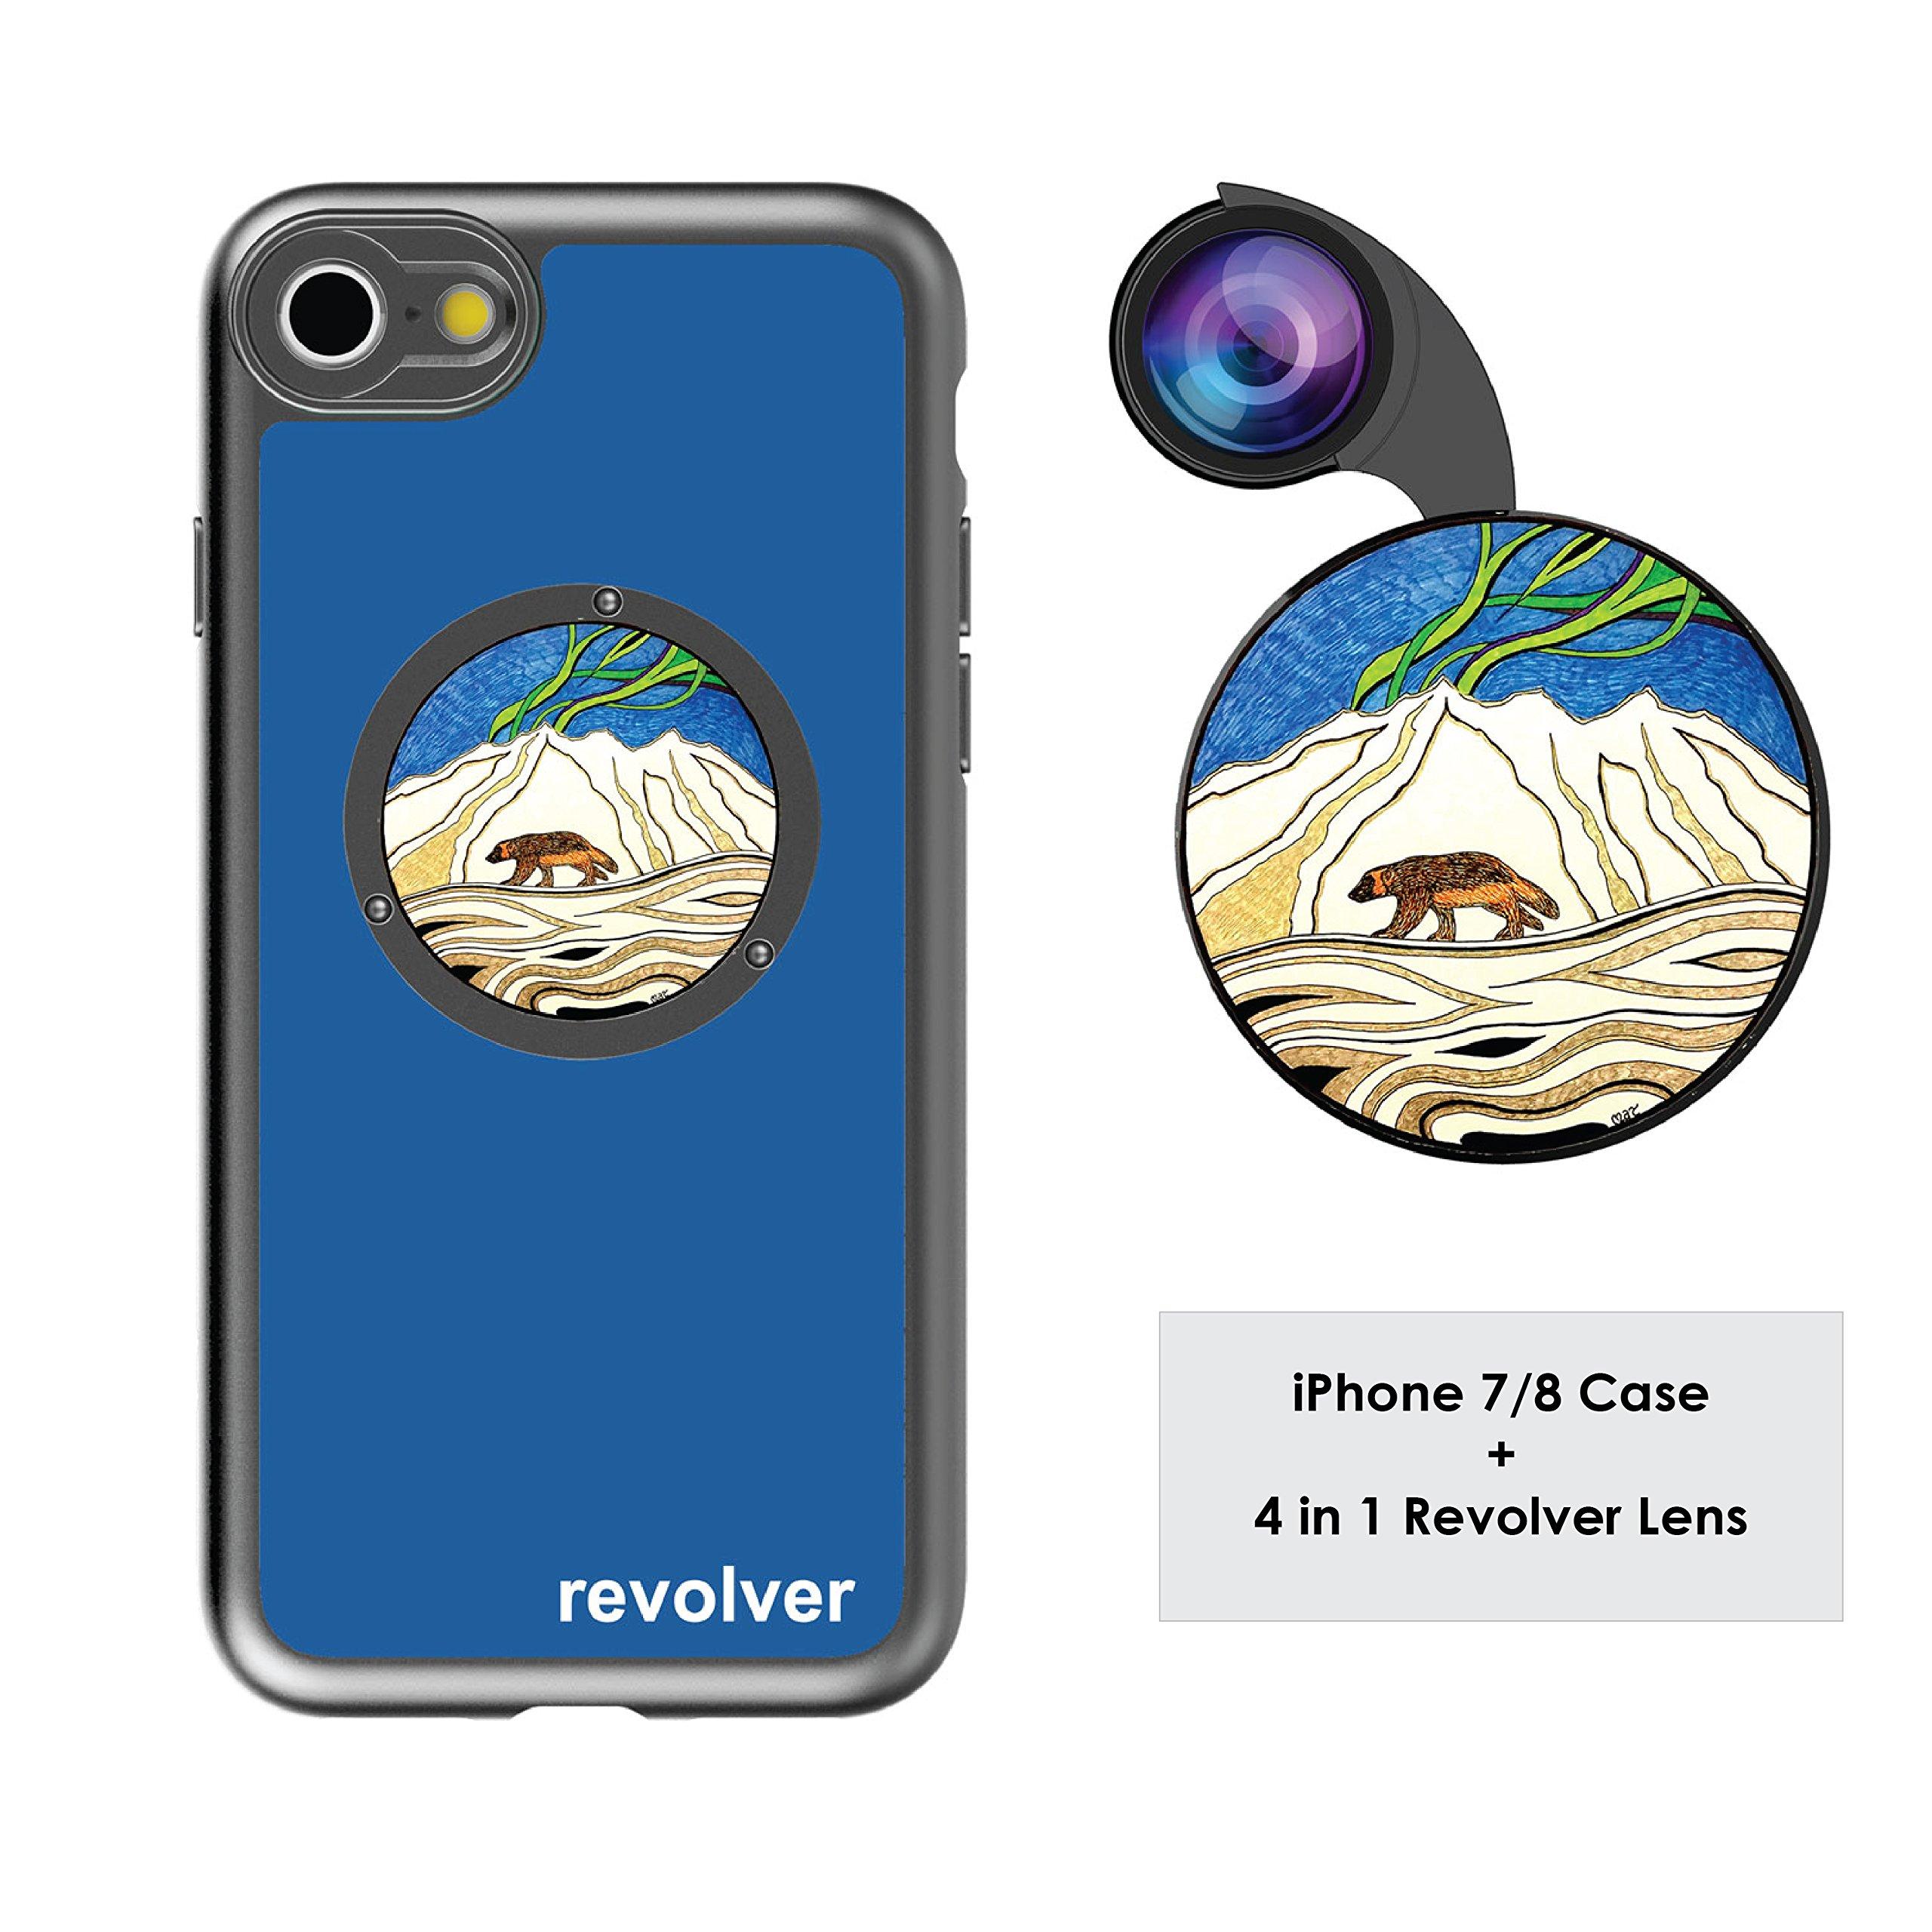 Funda y 4  Lentes Ztylus Revolver p/ iPhone 7/8 - Wolveri...